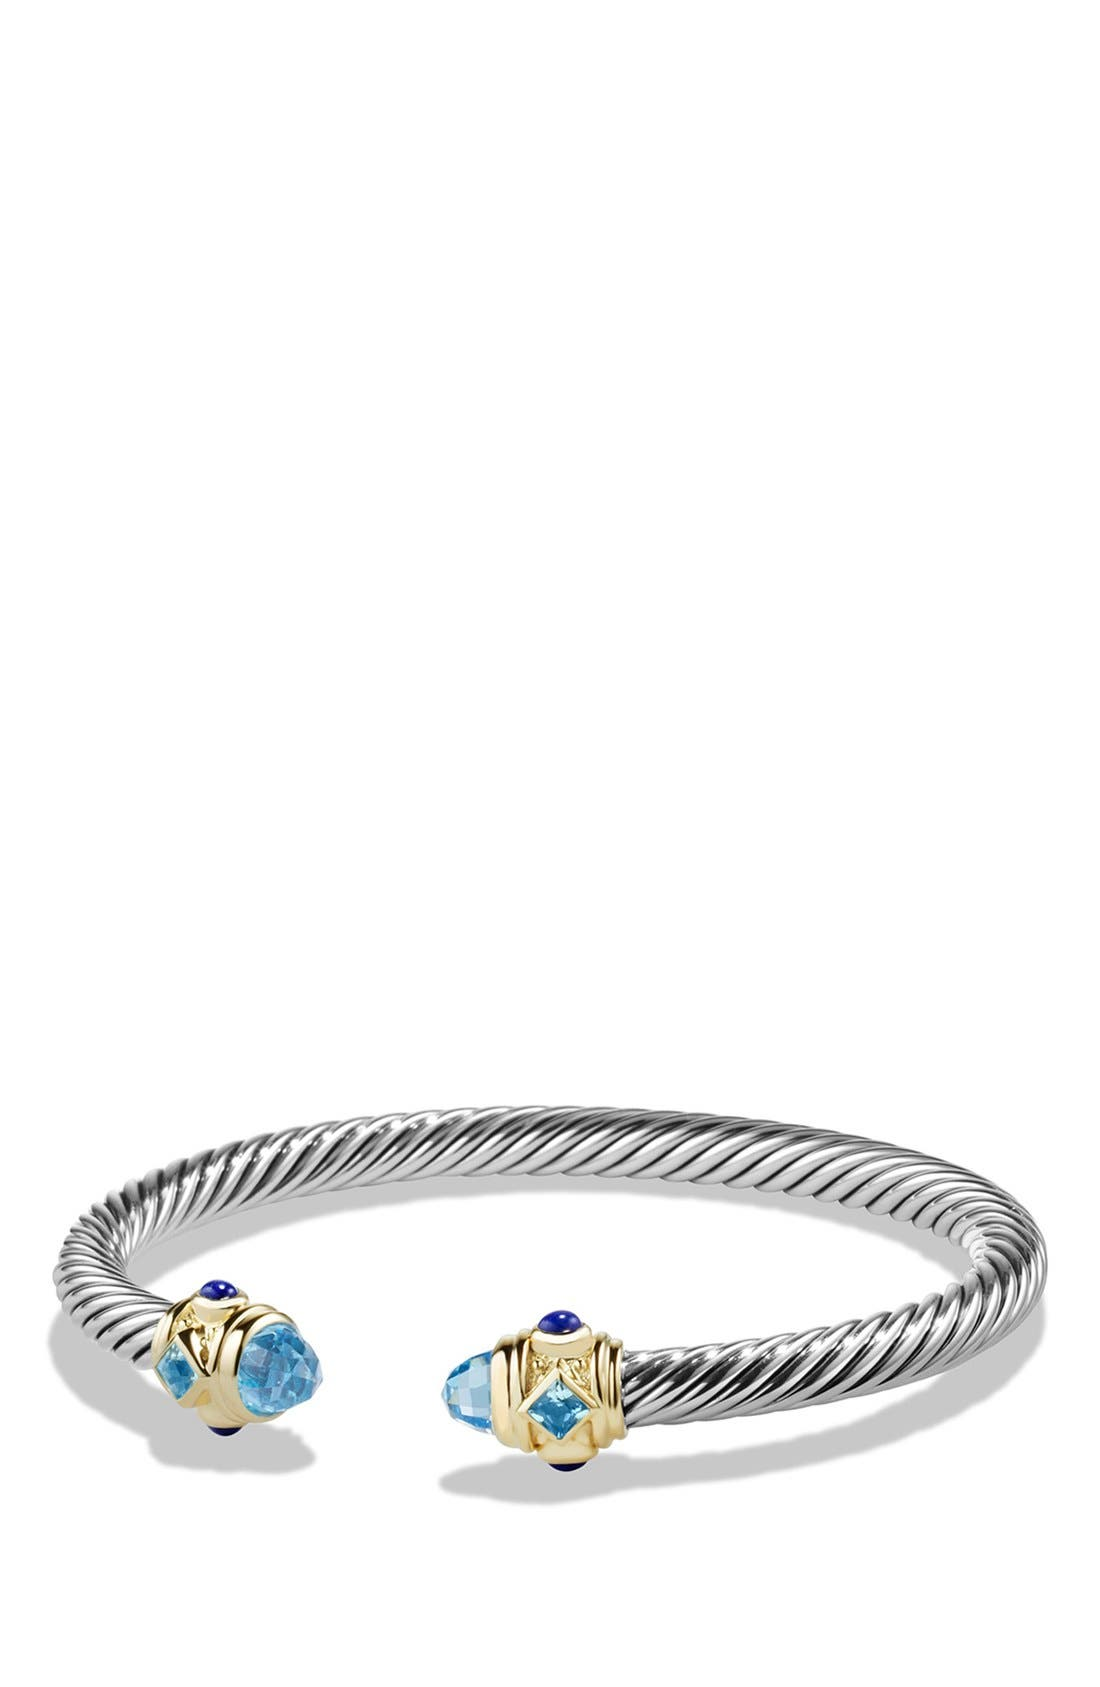 Renaissance Bracelet with Semiprecious Stone & 14k Gold, 5mm,                         Main,                         color, Blue Topaz